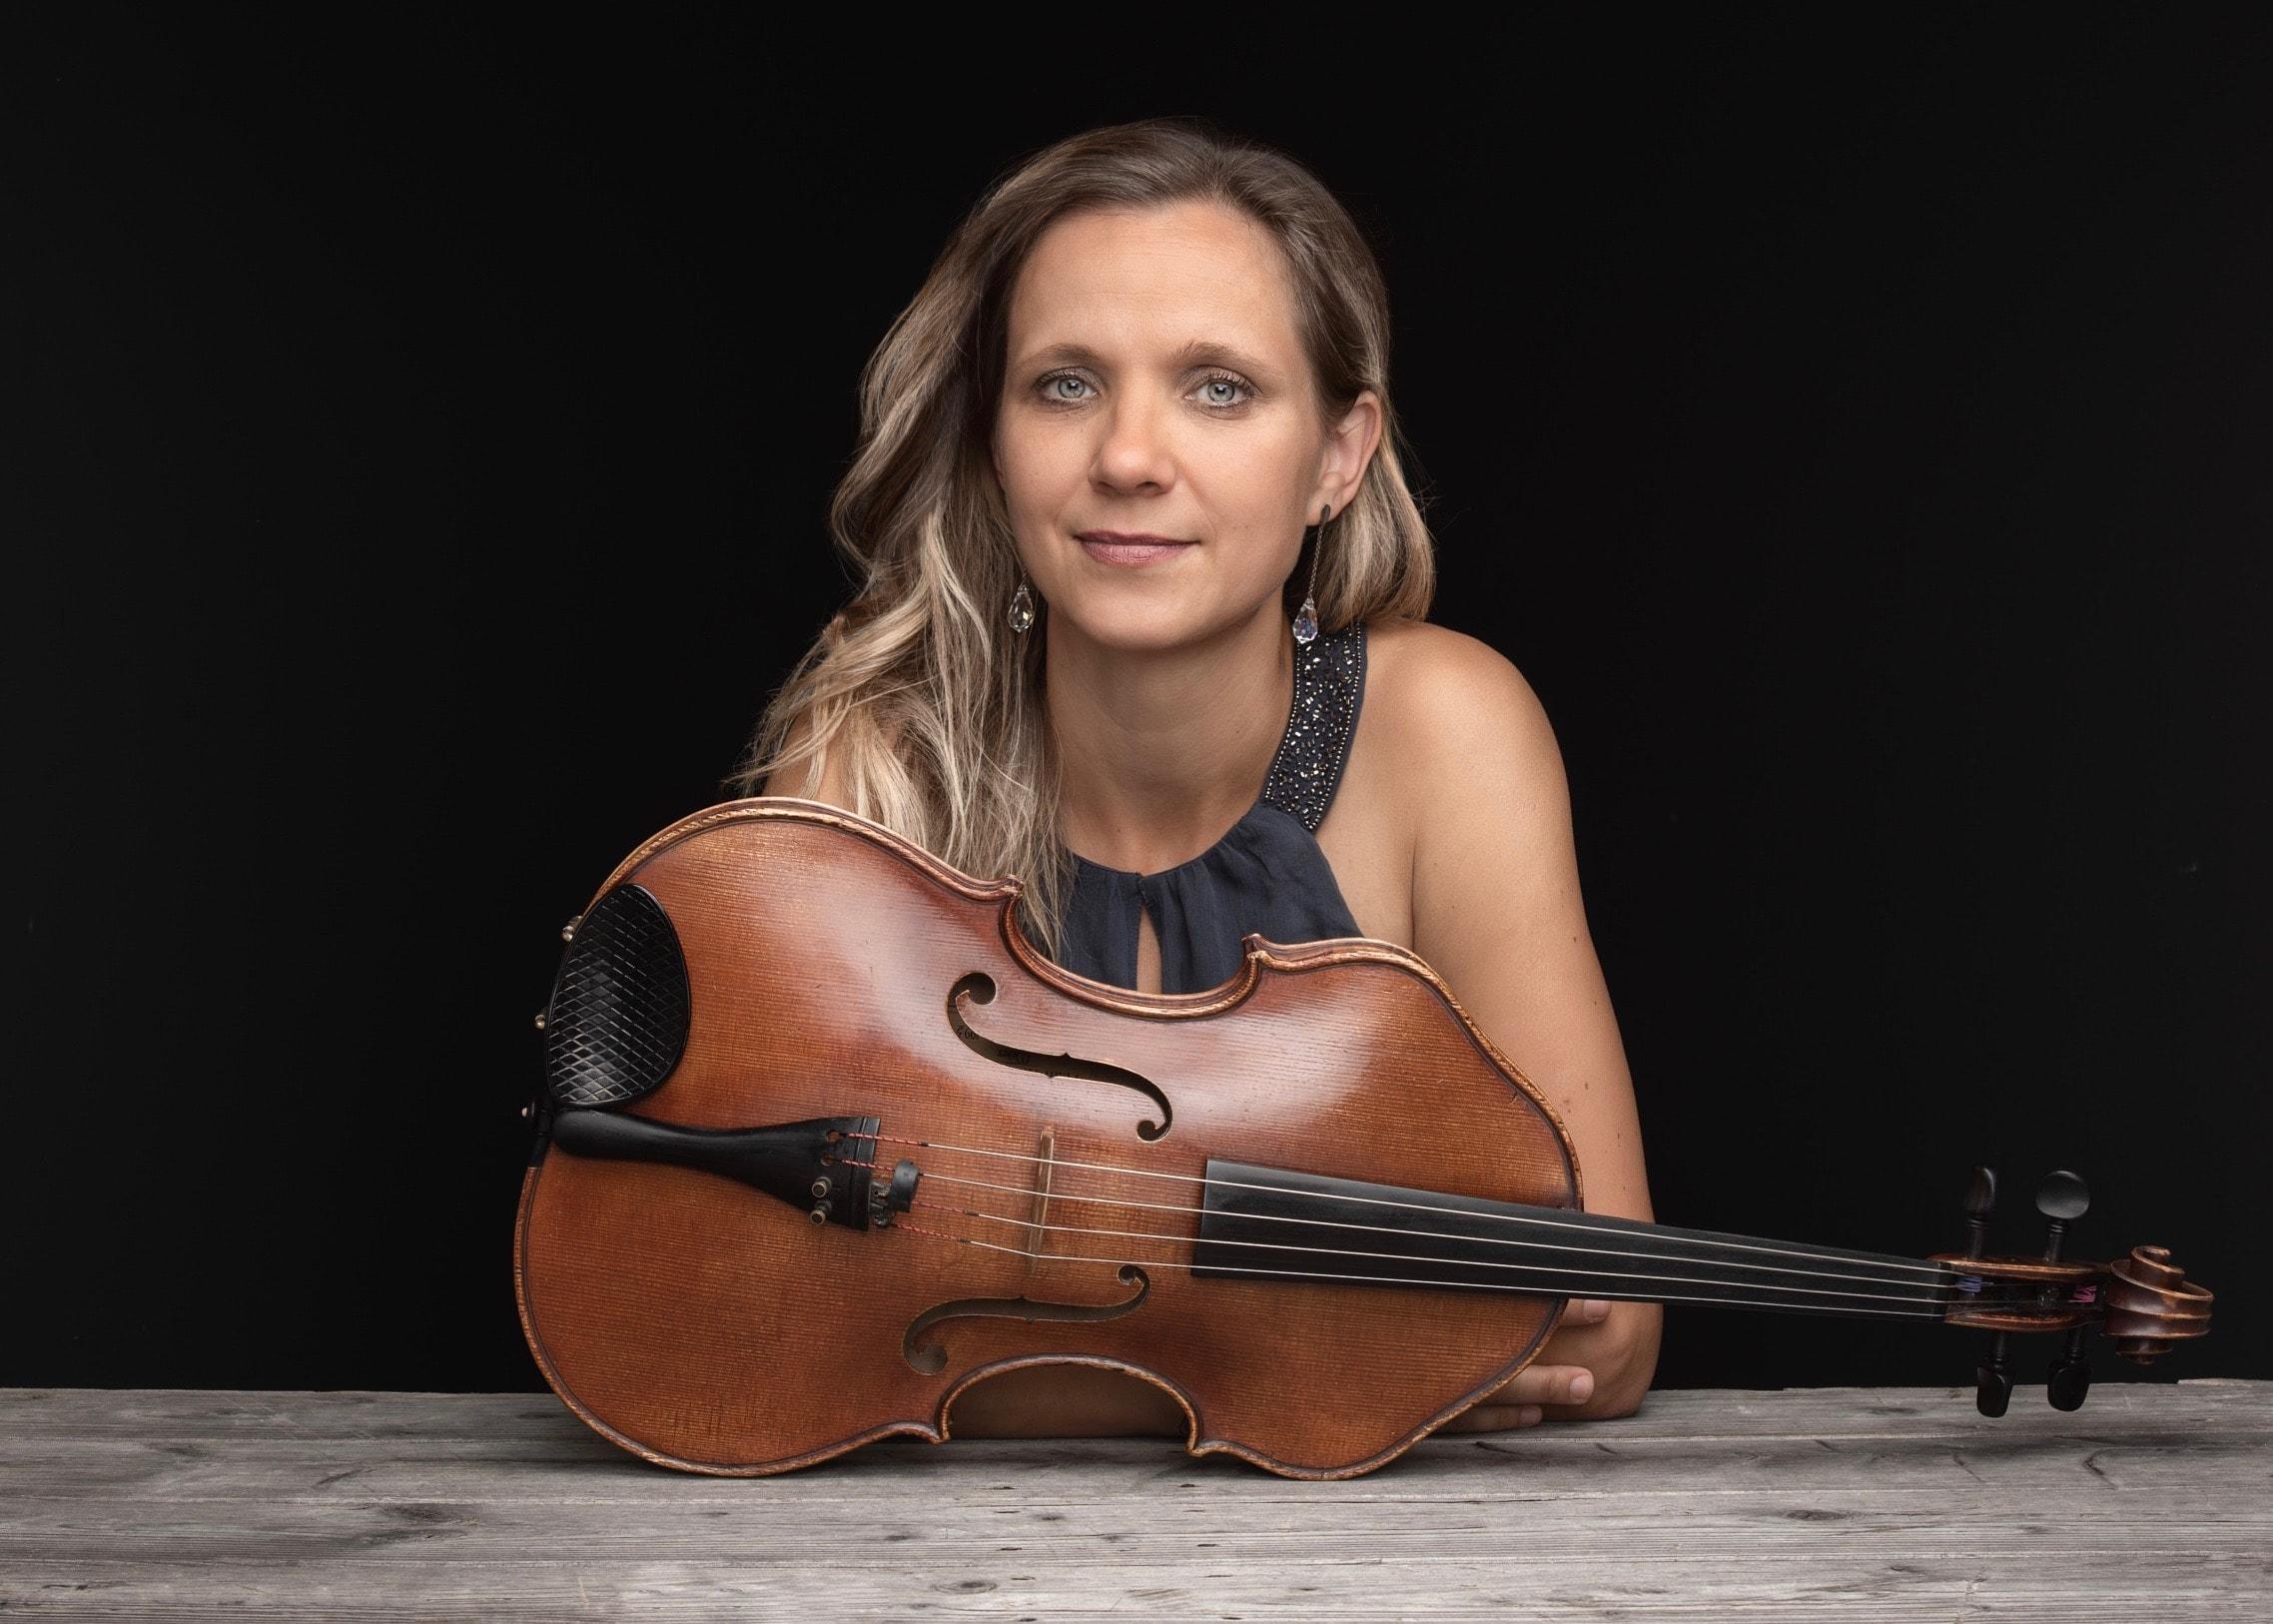 Natalia Mosca